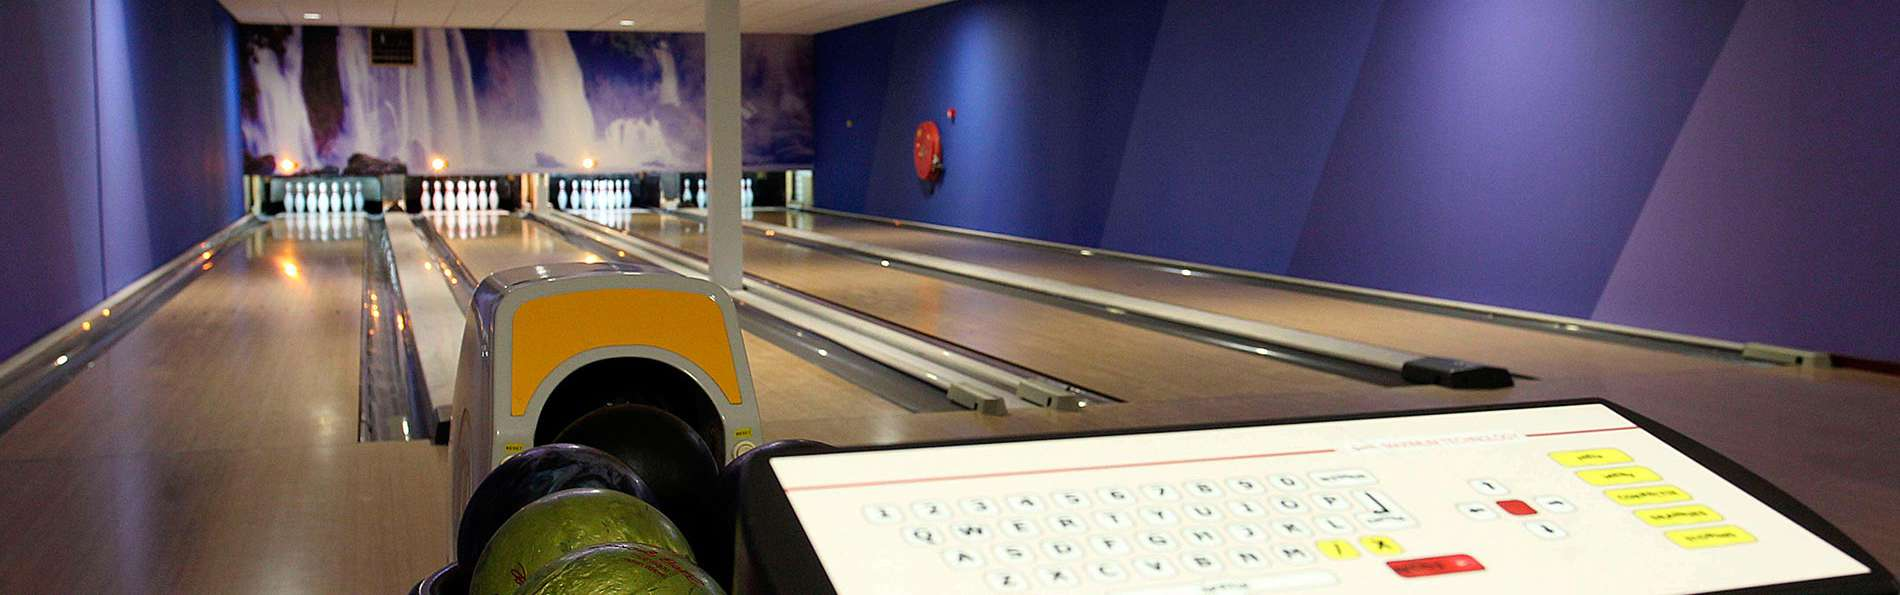 Hotel de Naaldhof - edit_bowling.jpg